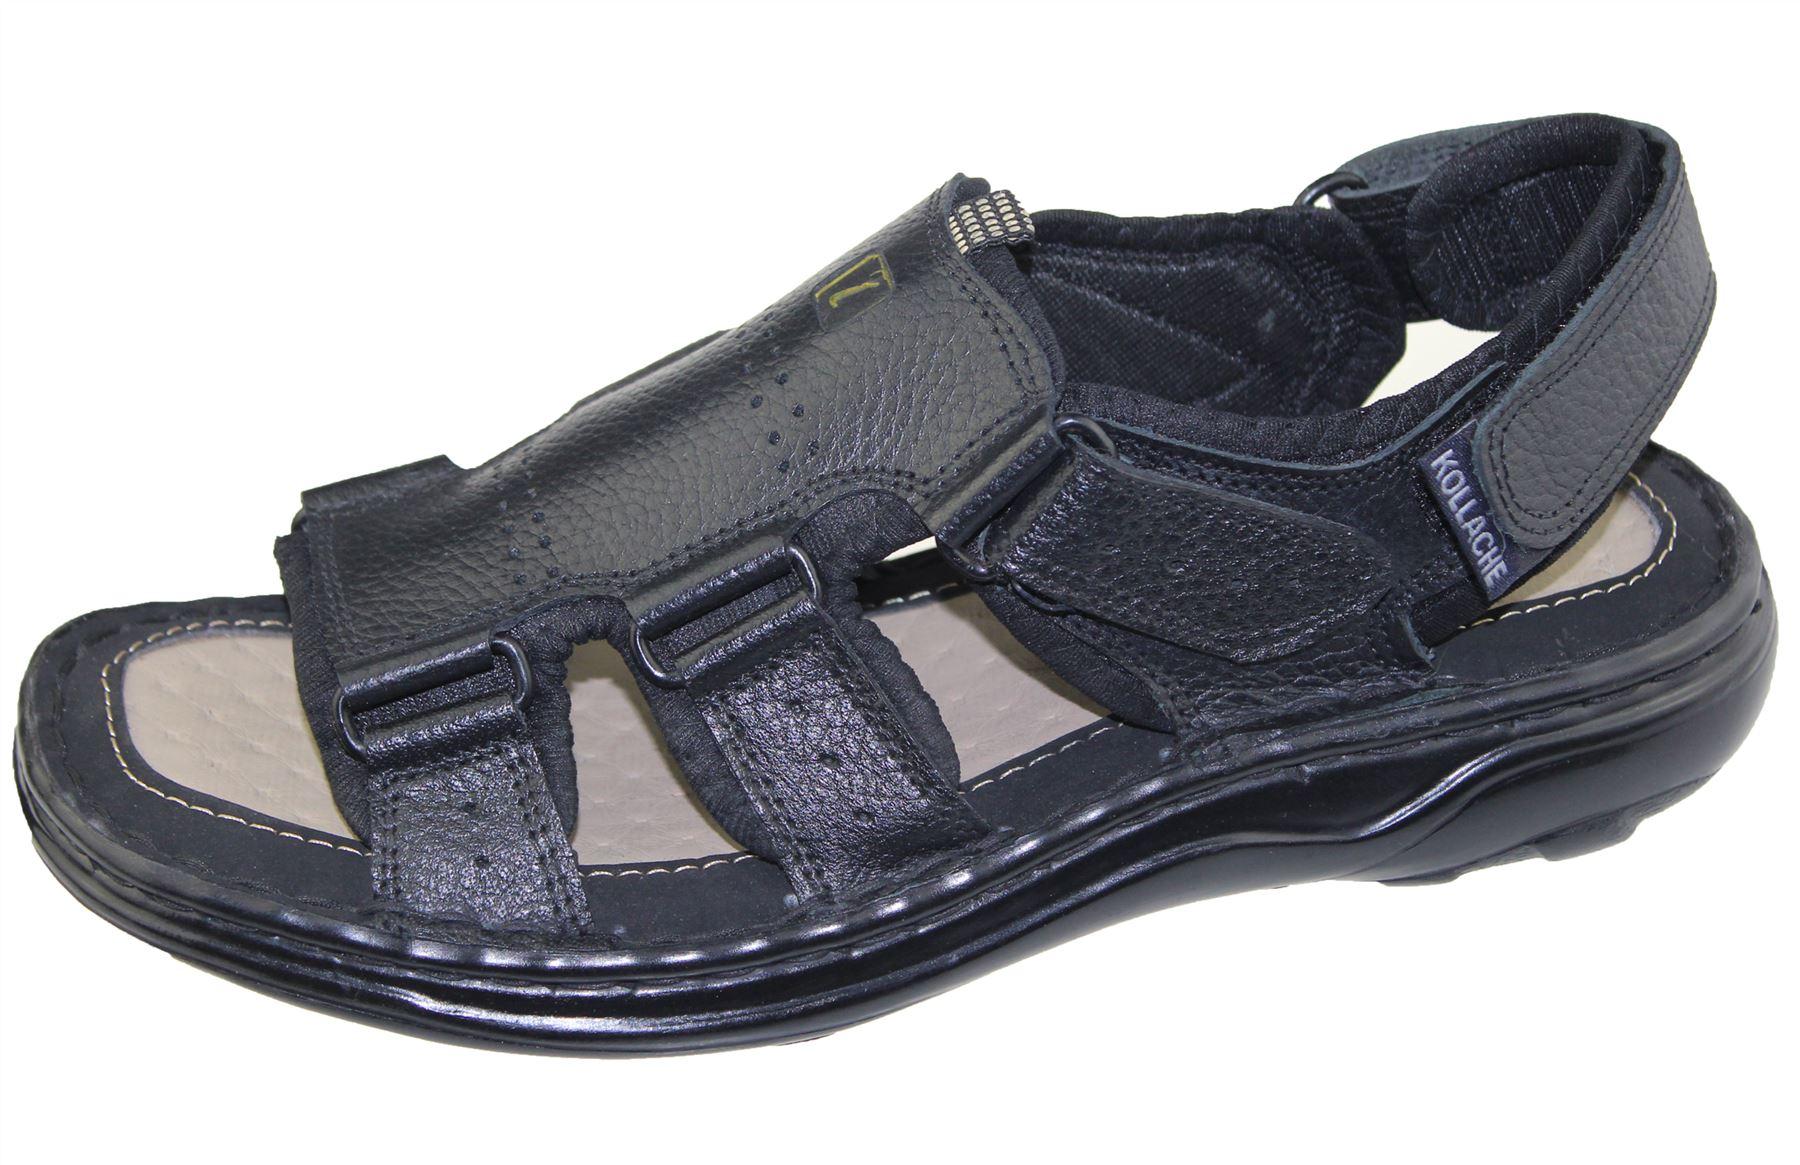 Mens Walking Fashion Sports Sandal Beach Buckle Summer Casual Slipper Shoes Size